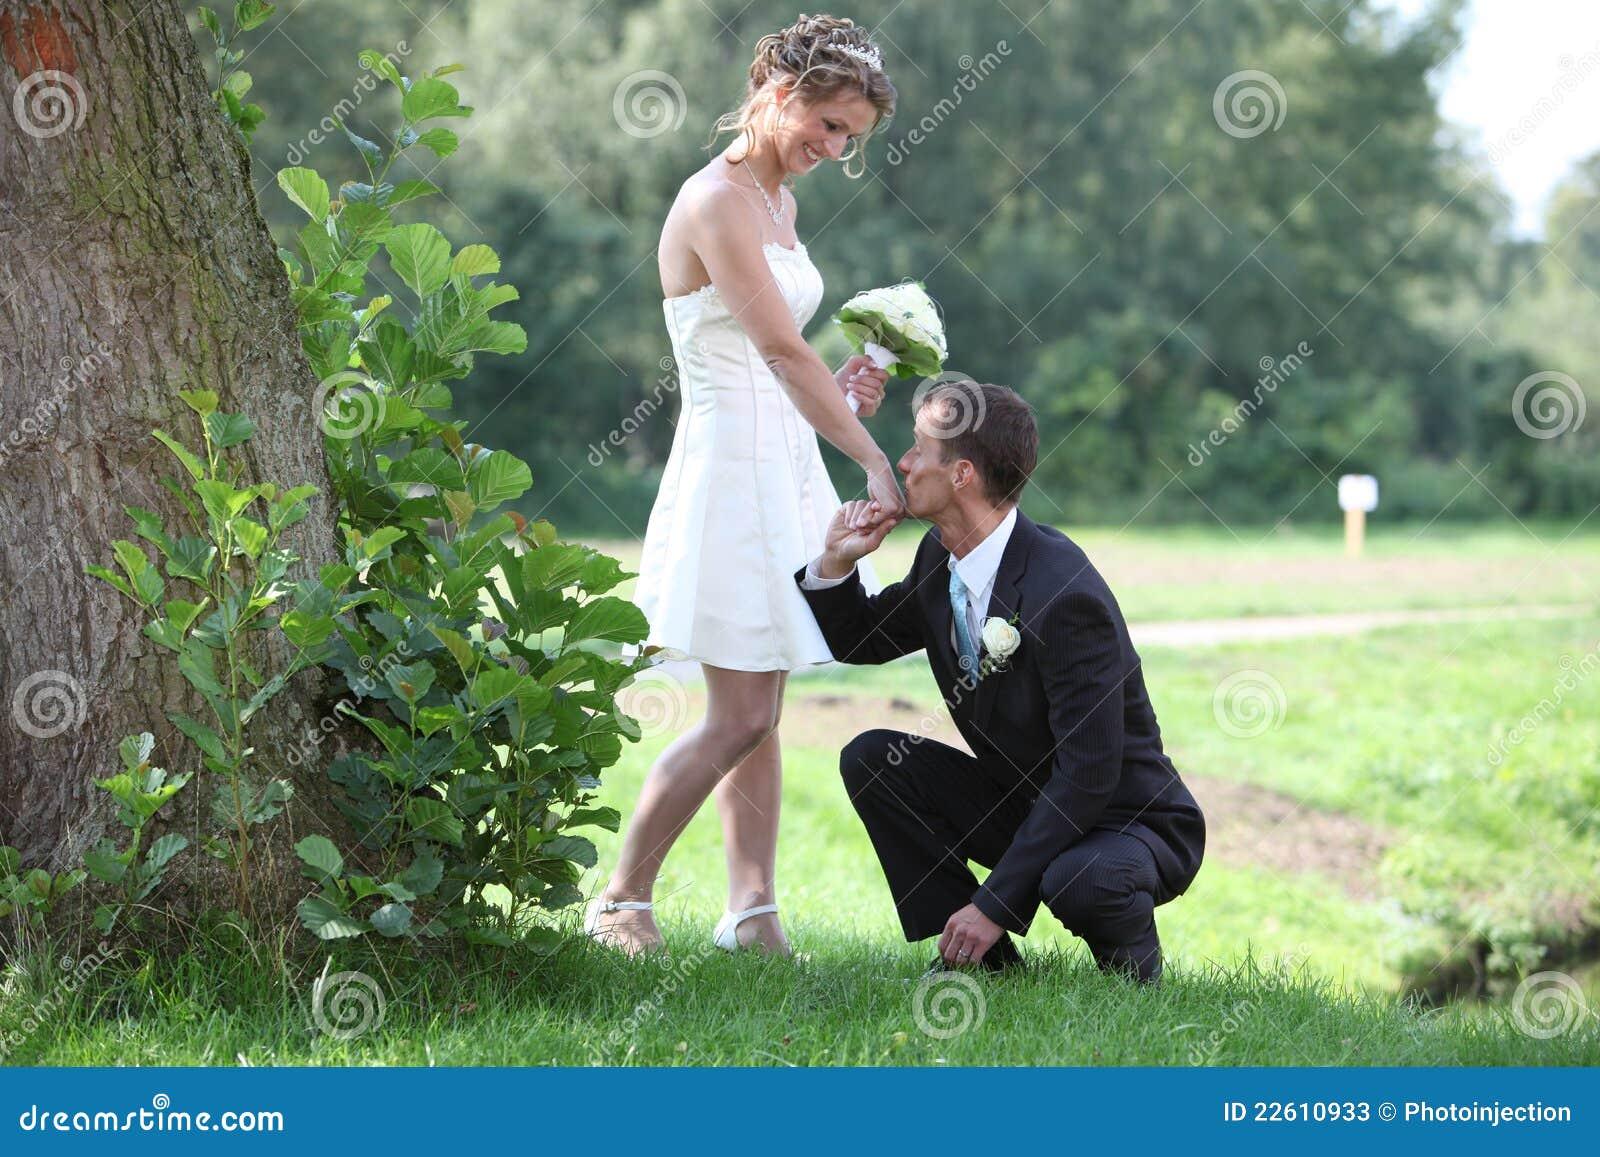 Sexy wedding dress with legs free mini dress photo made outdoor